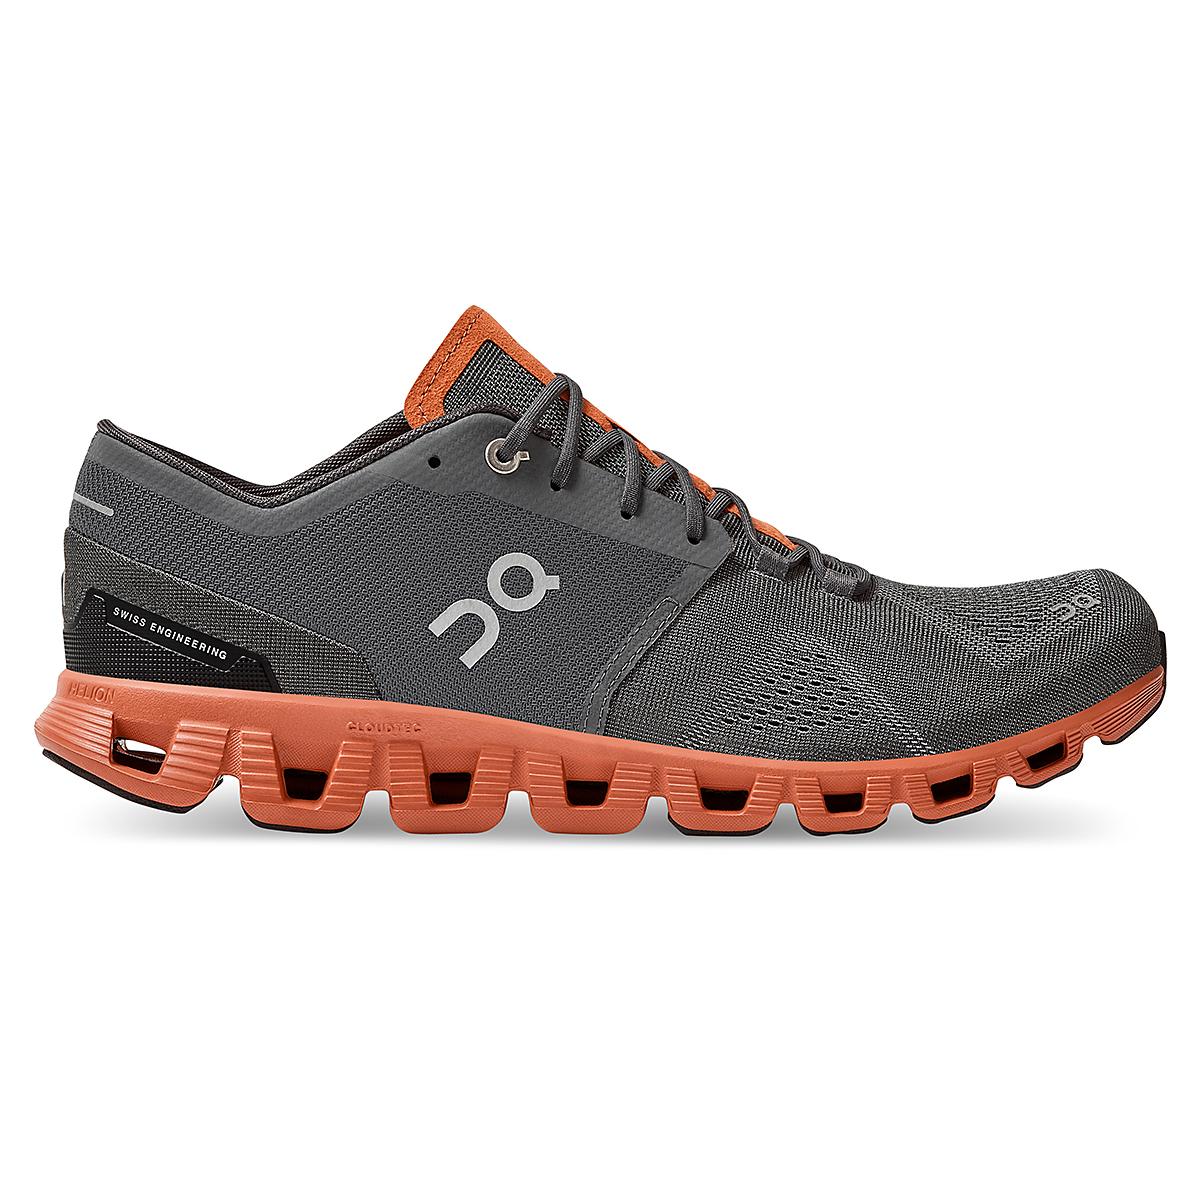 Men's On Cloud X 2.0 Training Shoe - Color: Rust/Rock - Size: 7 - Width: Regular, Rust/Rock, large, image 1